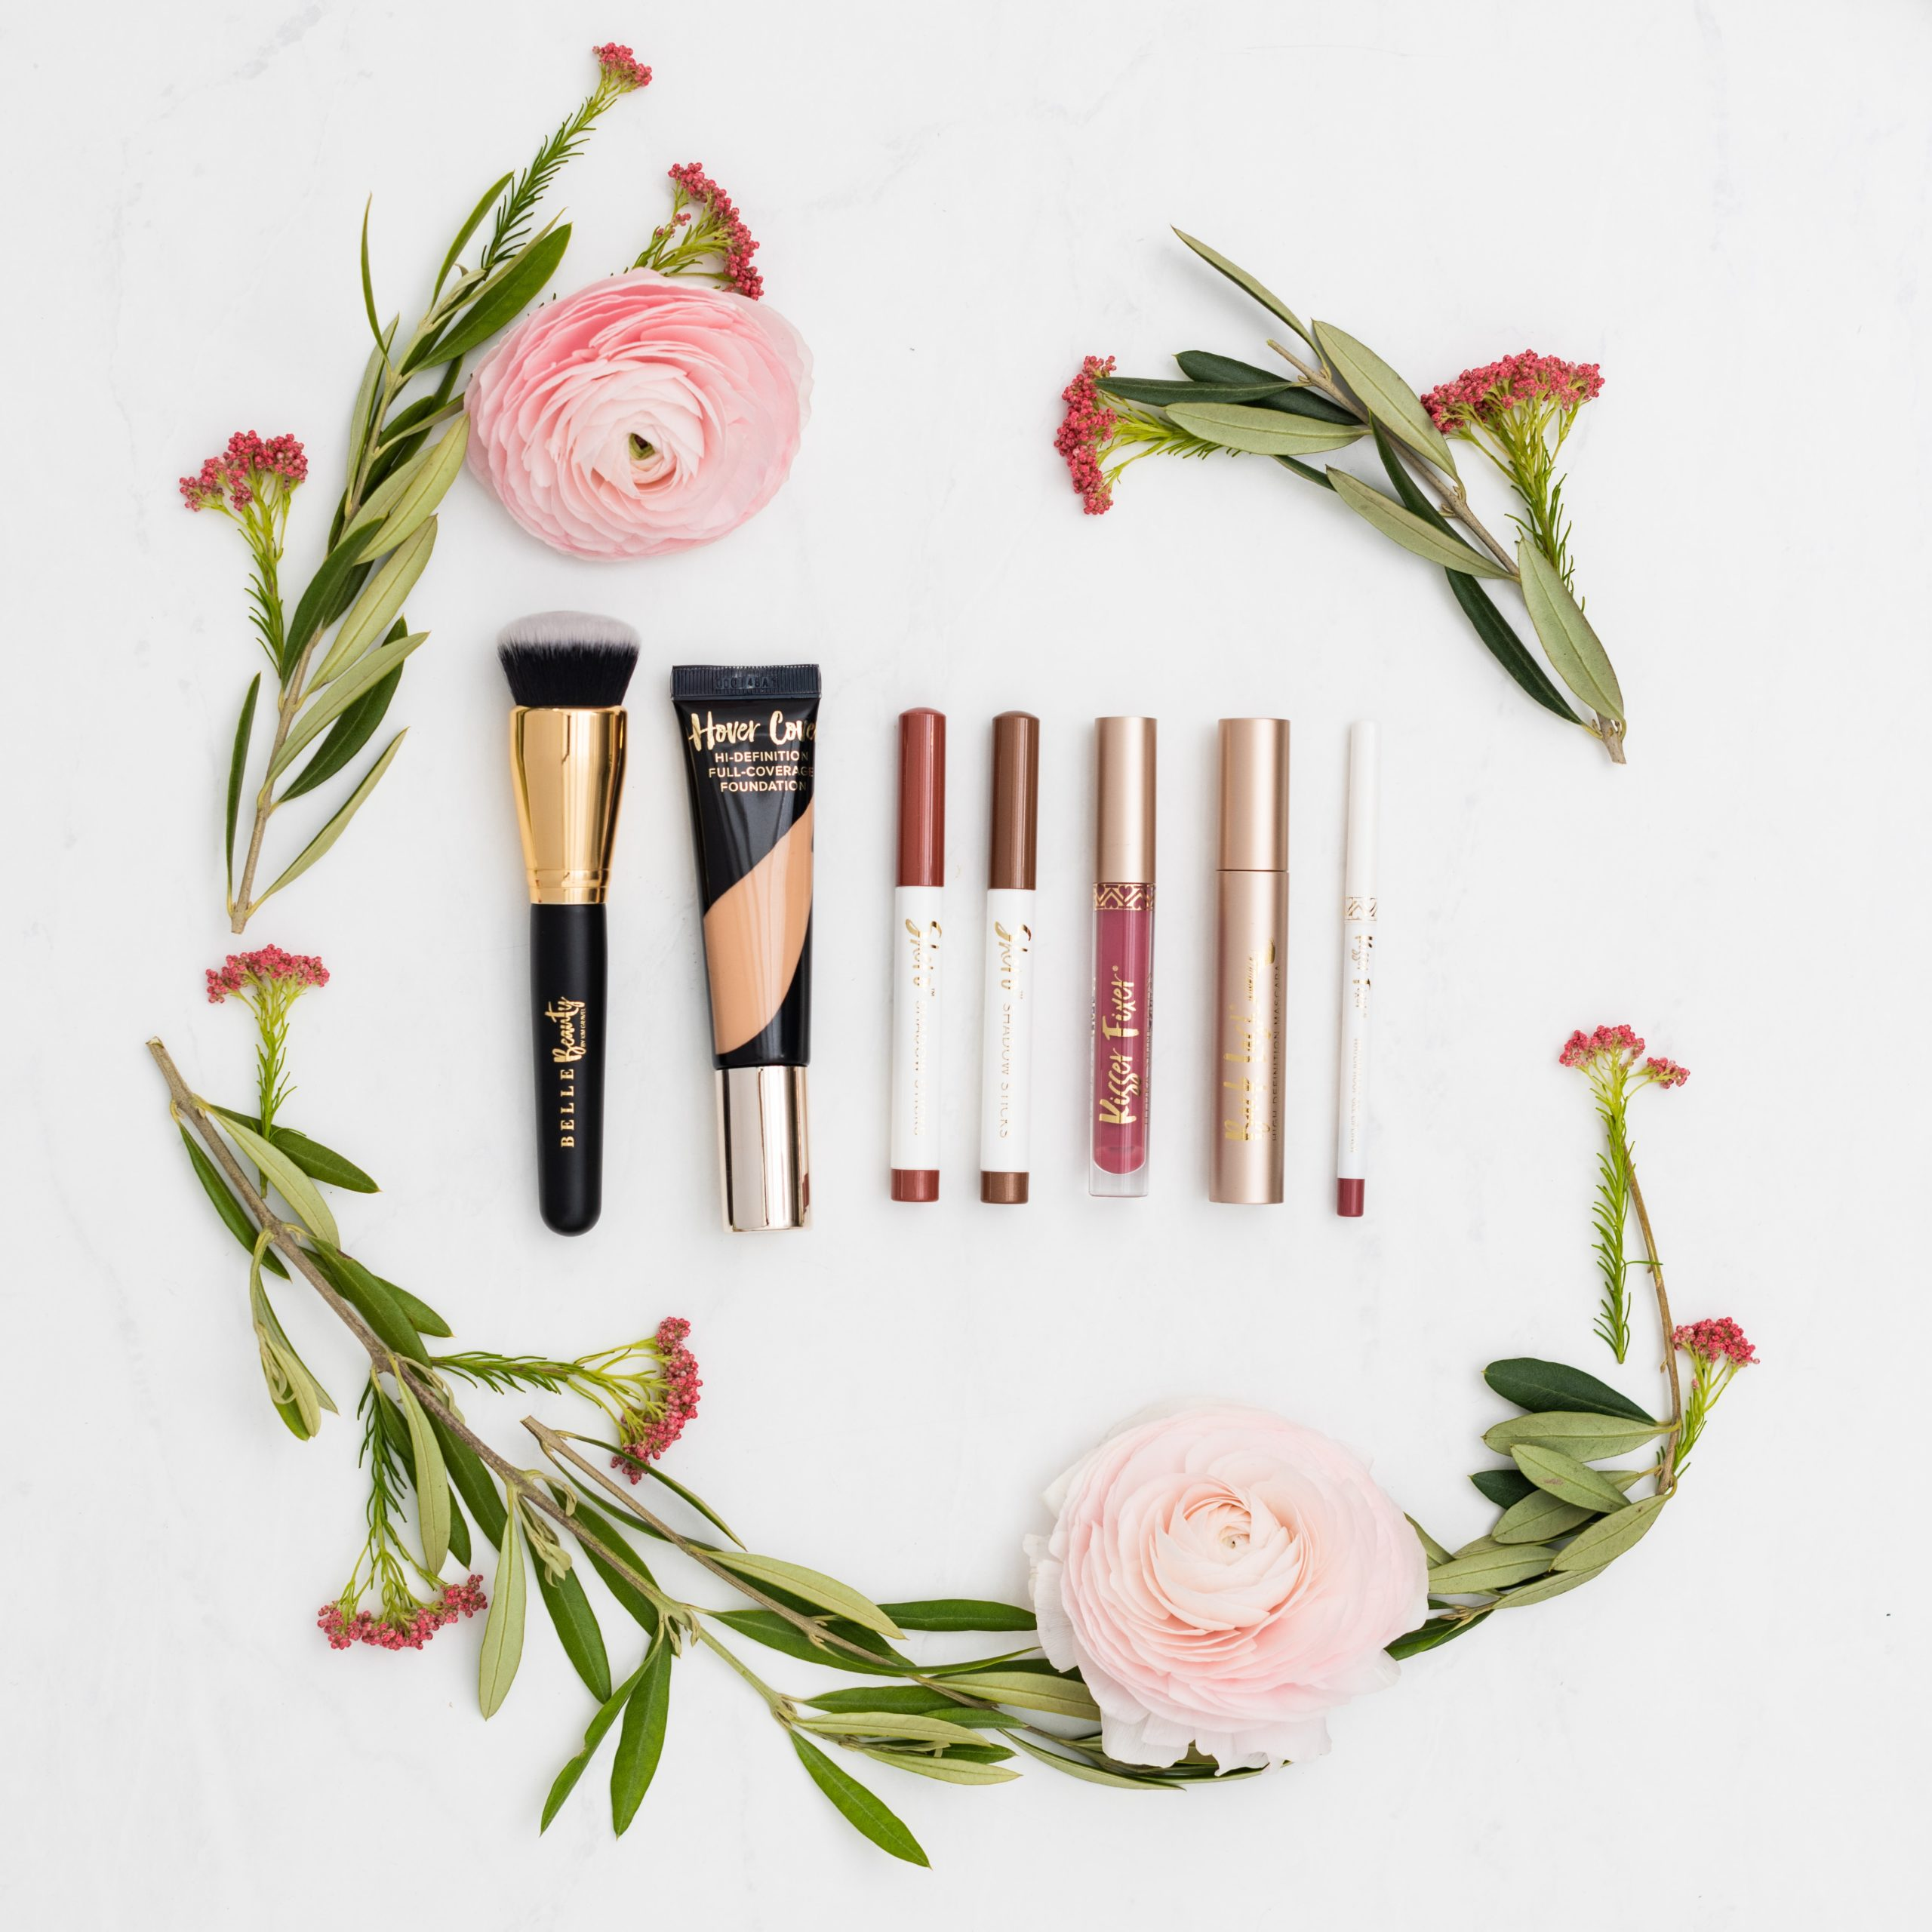 10 Best Drugstore Liquid Lipsticks (Non-Drying and Long-Lasting)